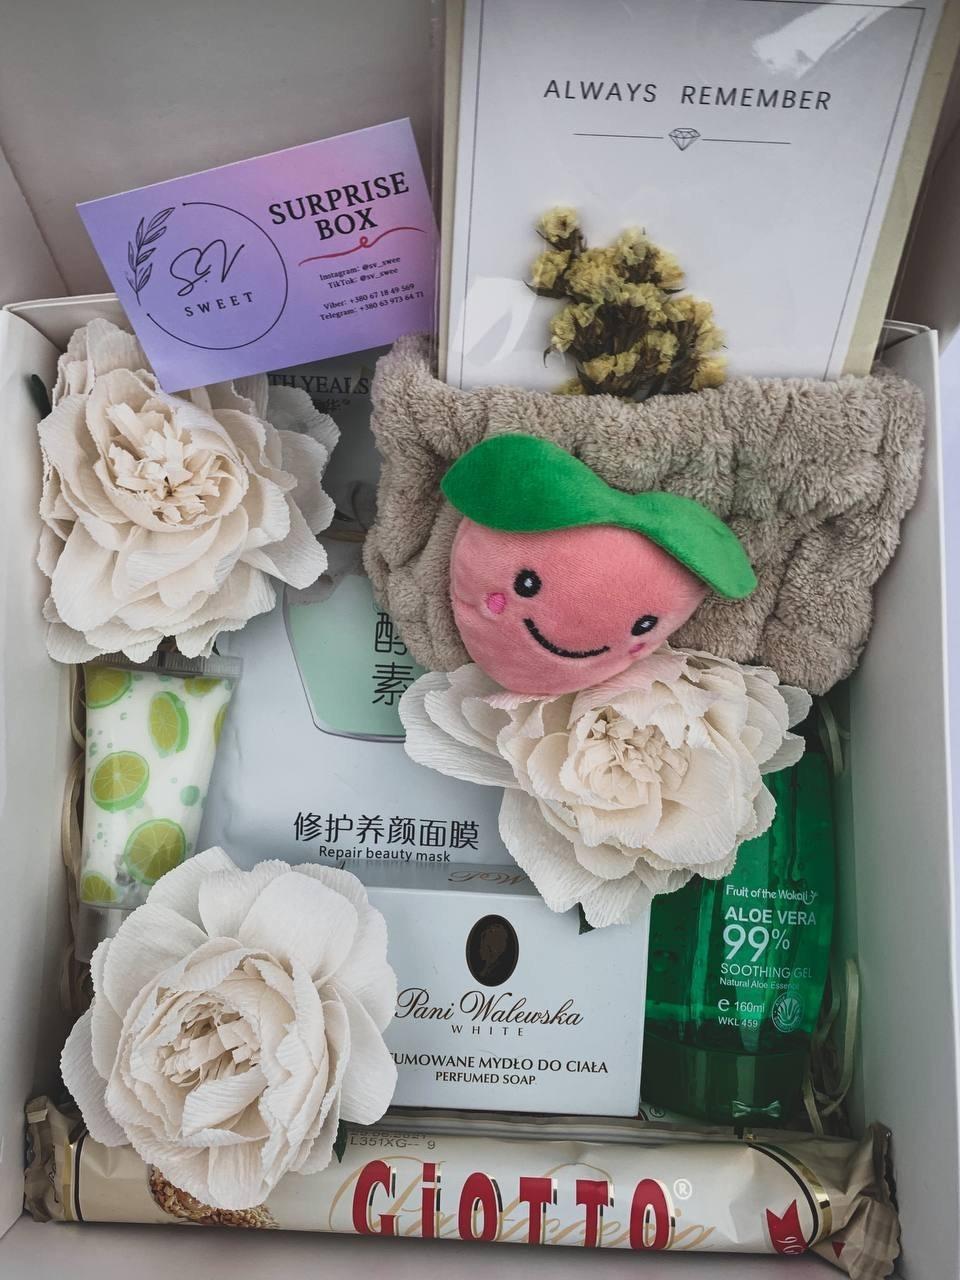 Подарочный набор №2 Surprise box ніжність для девушек, подруг и женщин (Gioto Fererro, Pani Walewska, и т.п. ) 8 шт